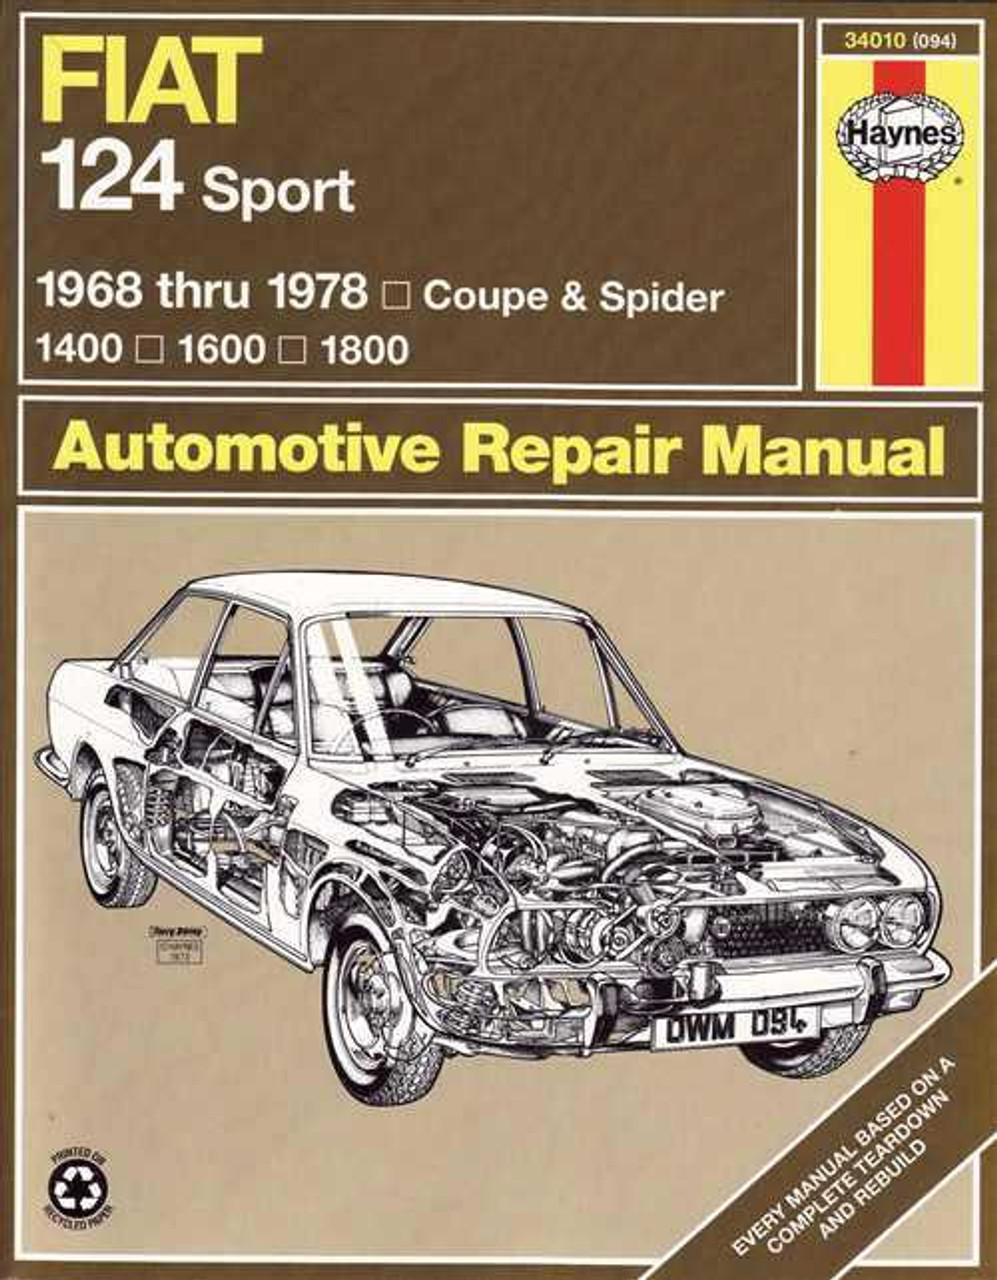 fiat 124 spider service manual